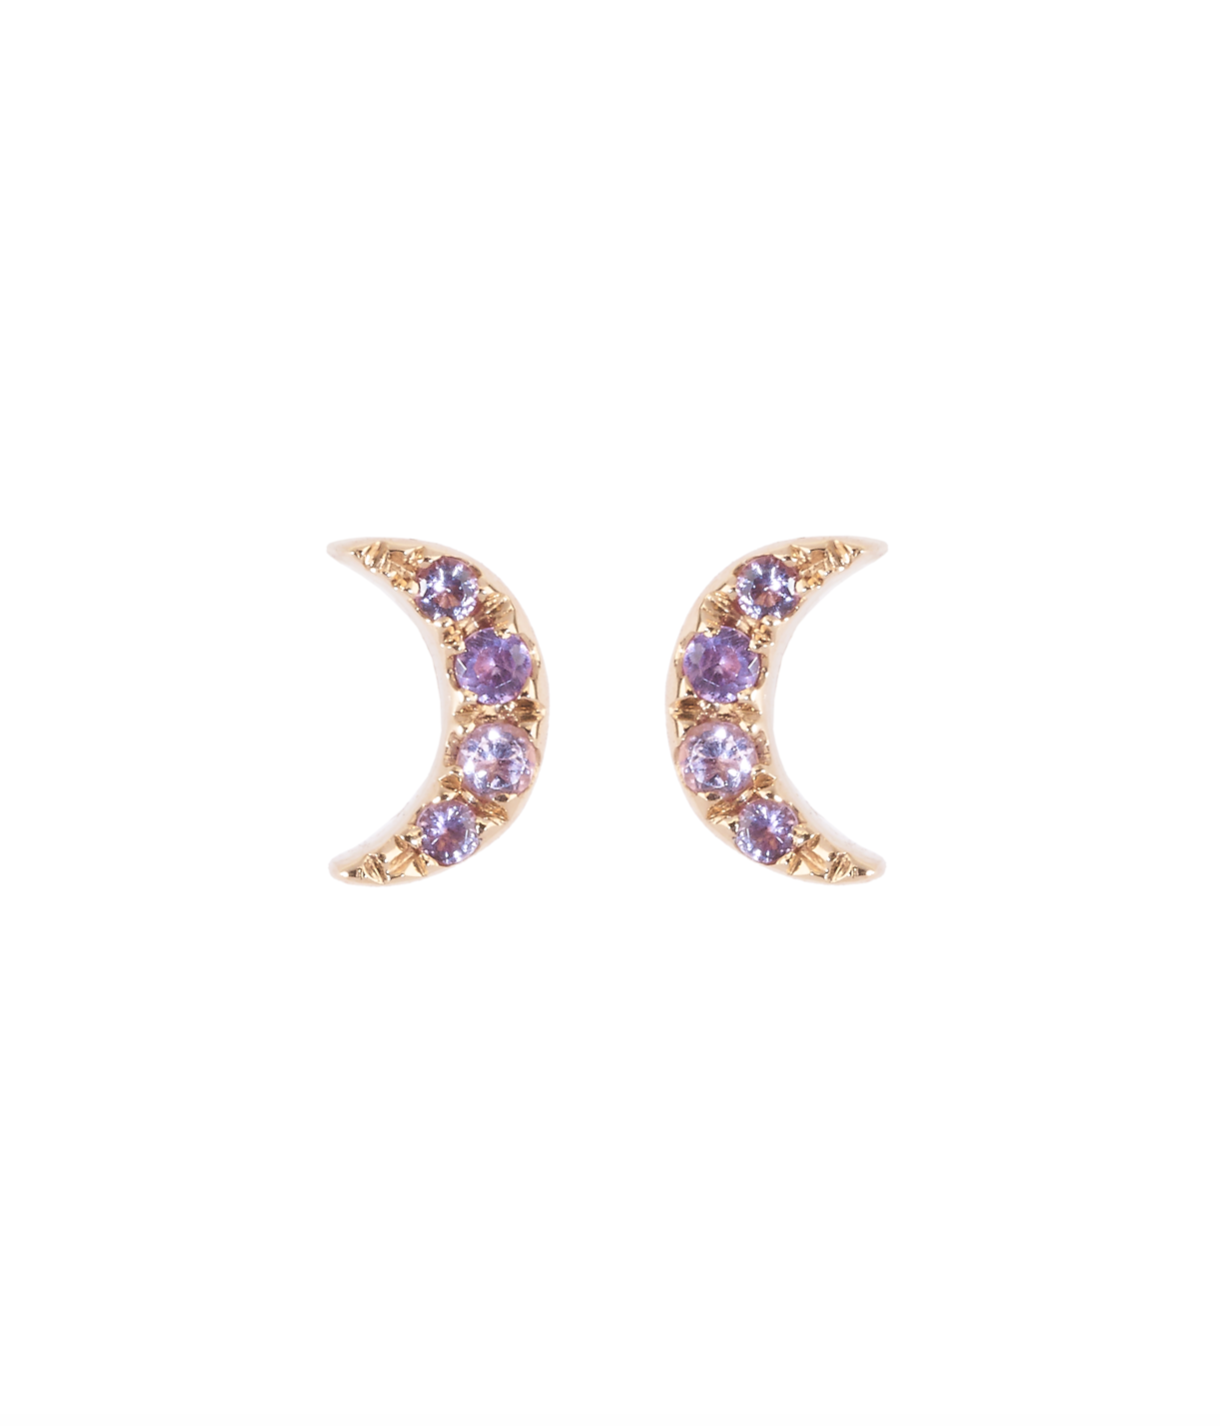 Moonlight Amethyst Earrings by Marmari on curated-crowd.com